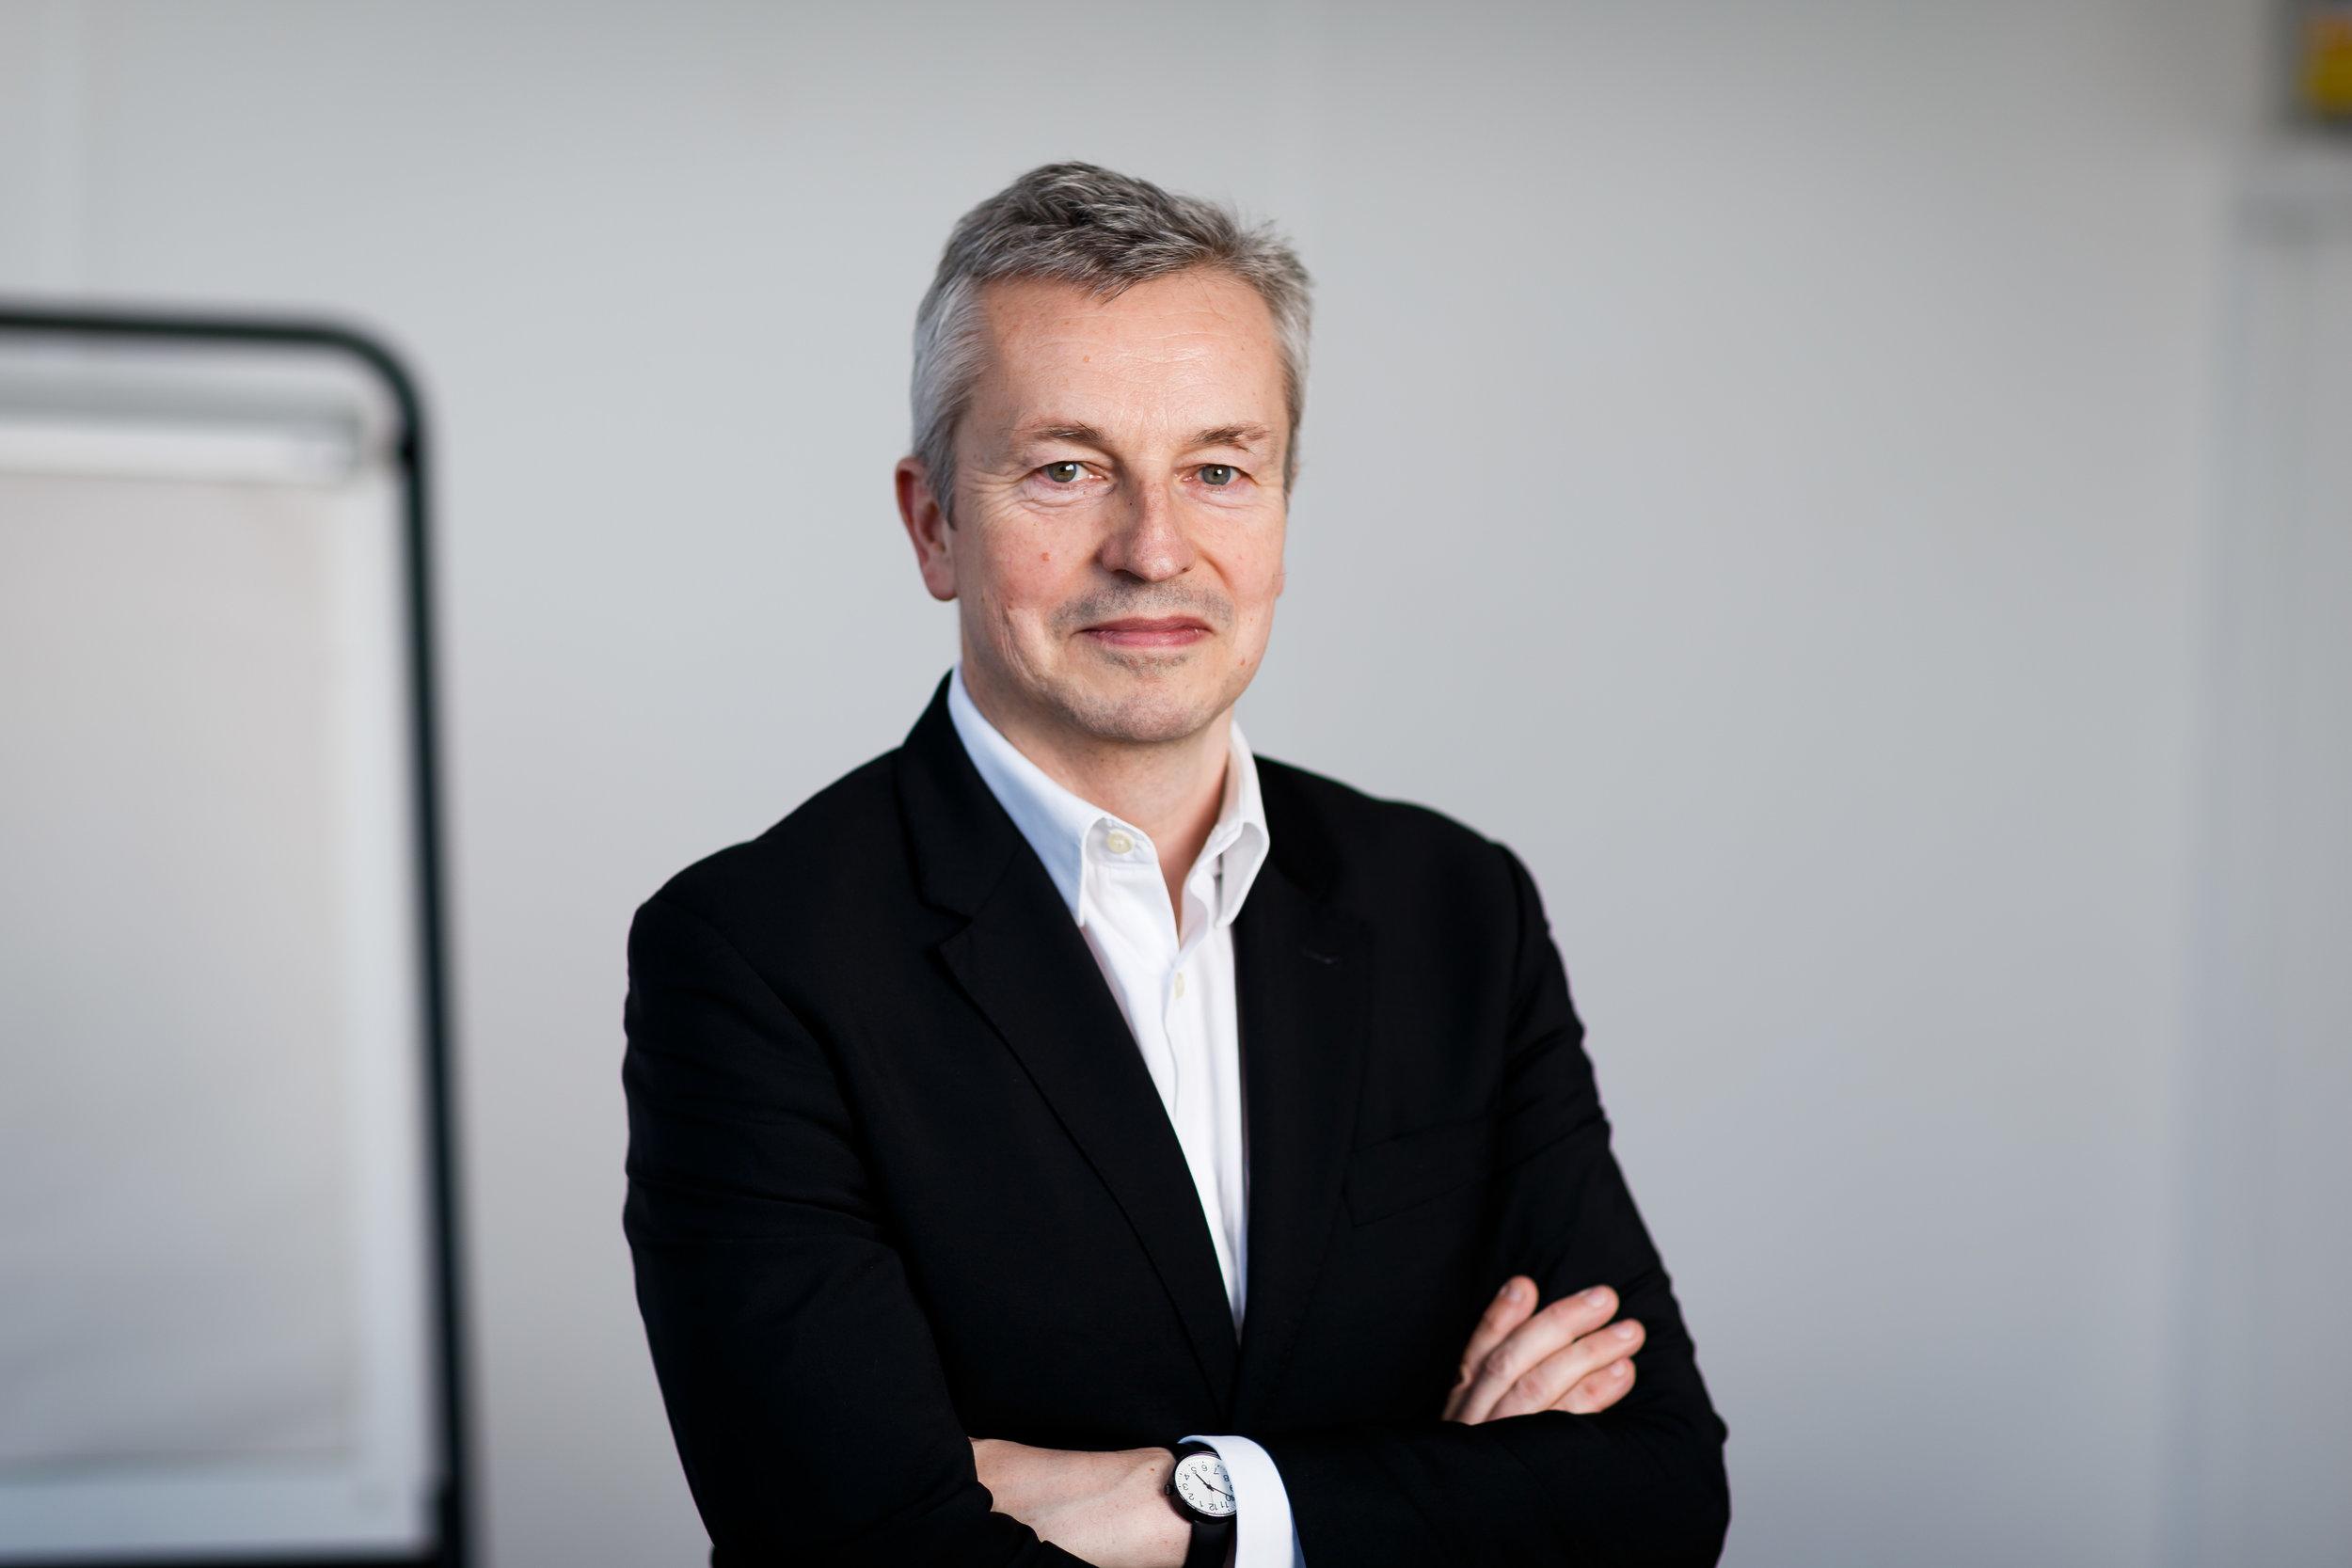 Paul Dickinson - Founder of CDP